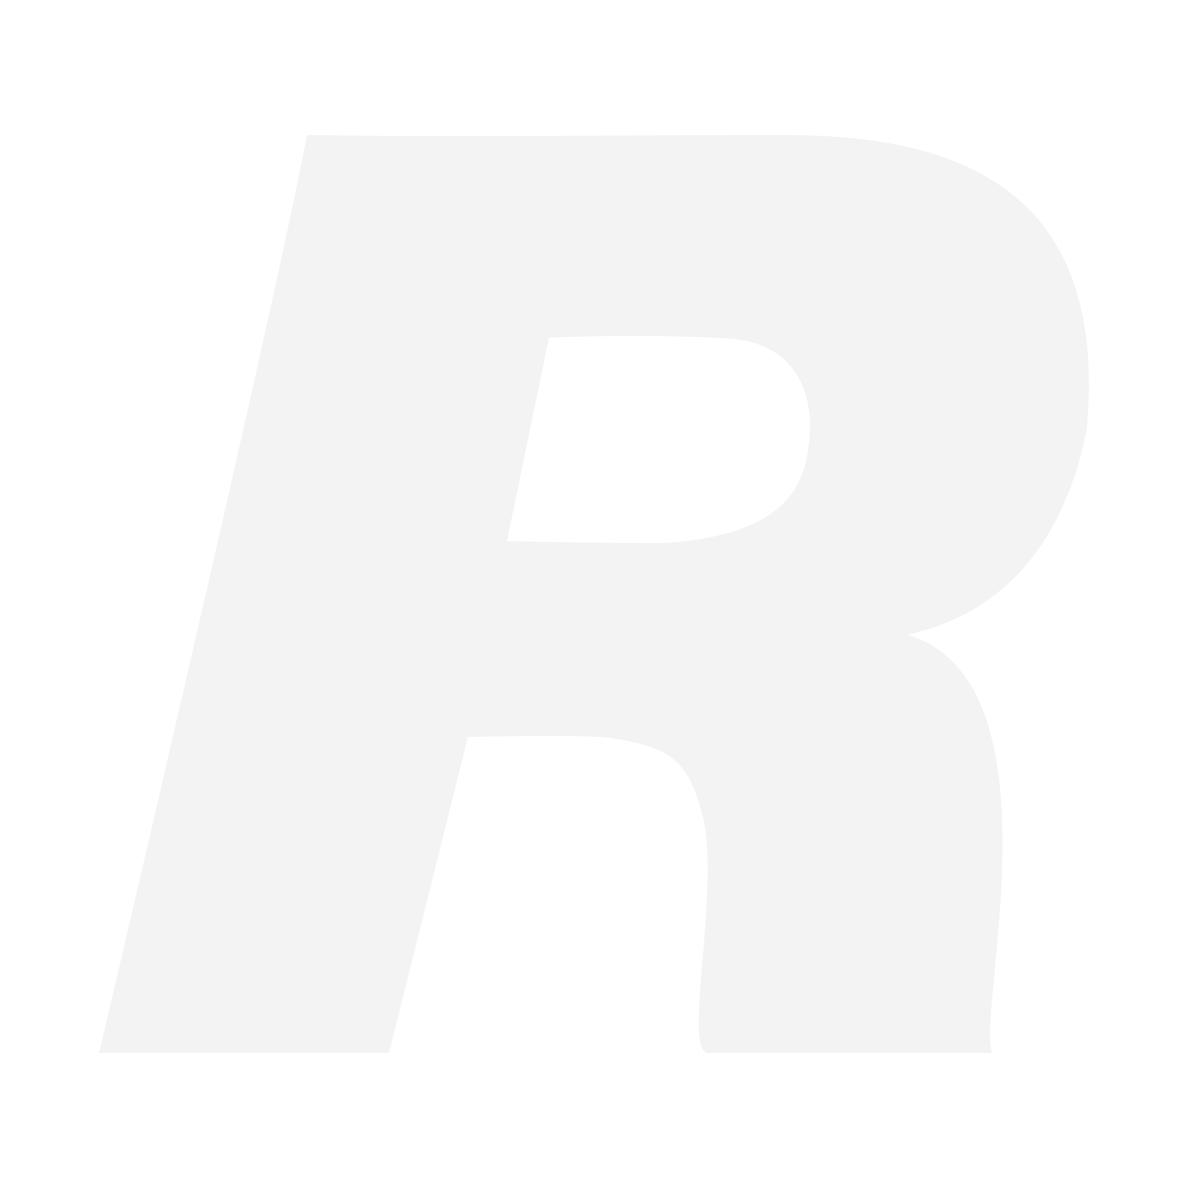 Röde Adapter, 3.5mm hona mono ---> XLR hane 3 stift